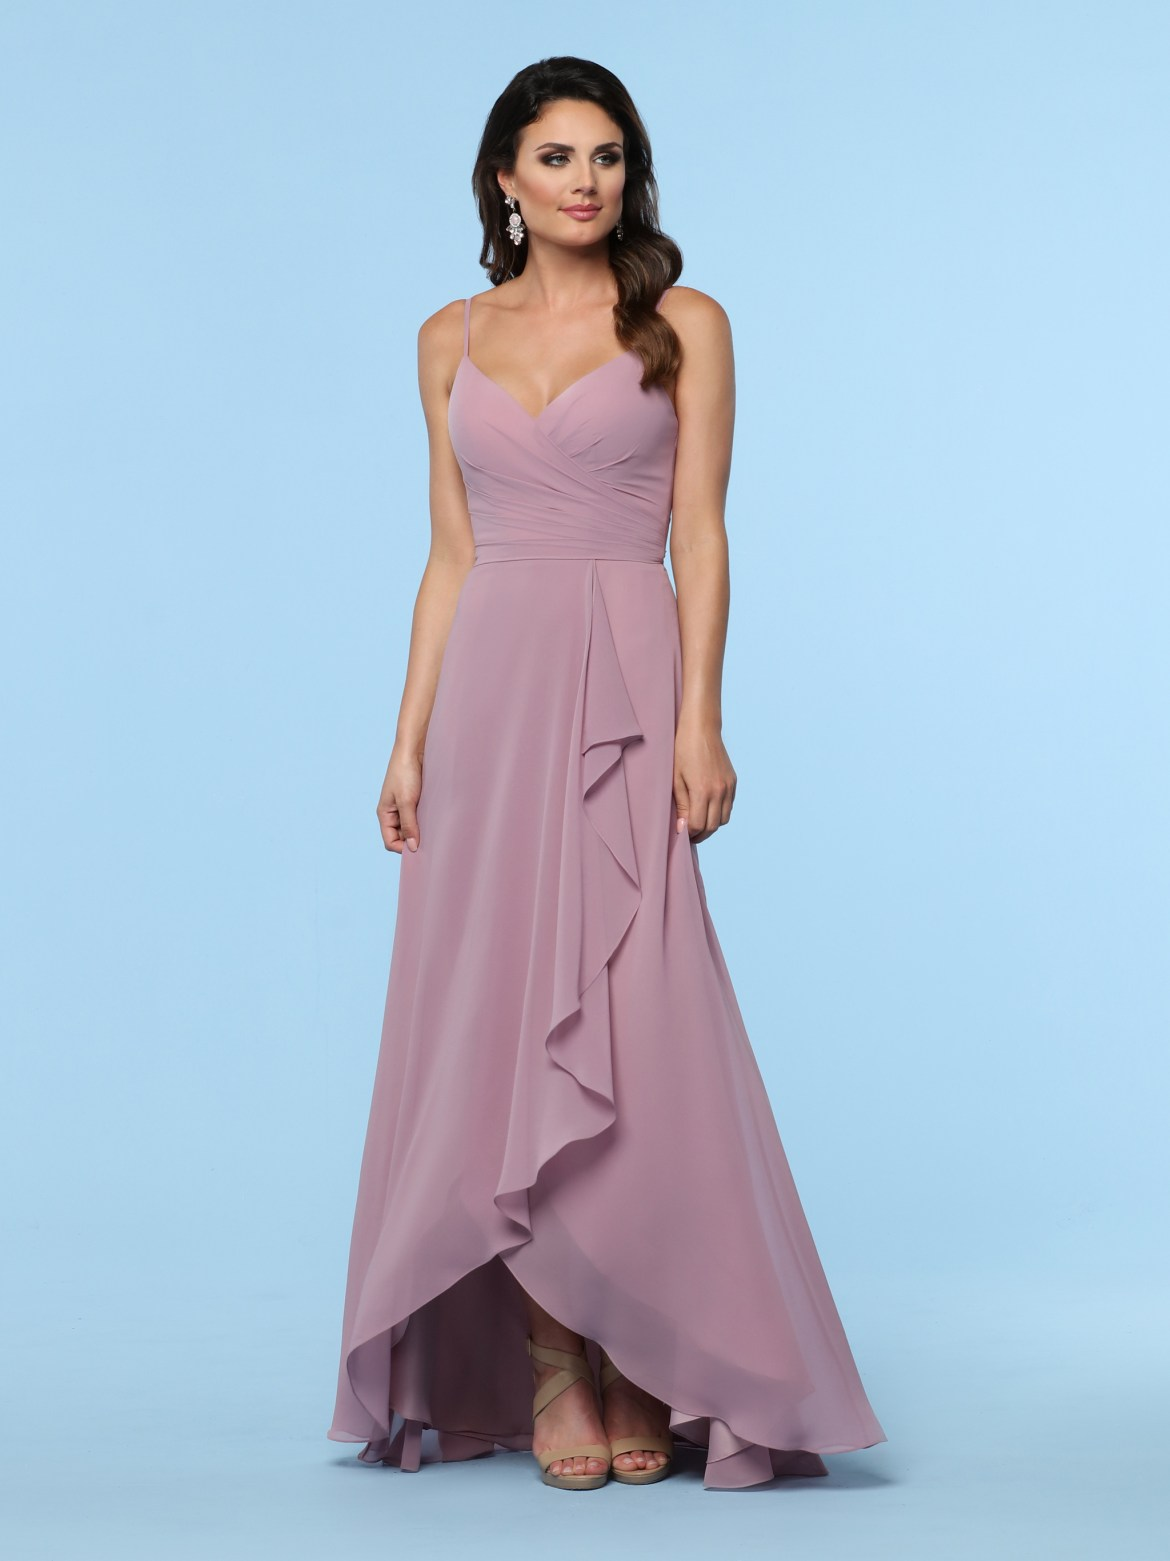 ca1e856beaf8 2019 DaVinci Bridesmaids Style  60380  Chiffon A-Line Bridesmaid Dress